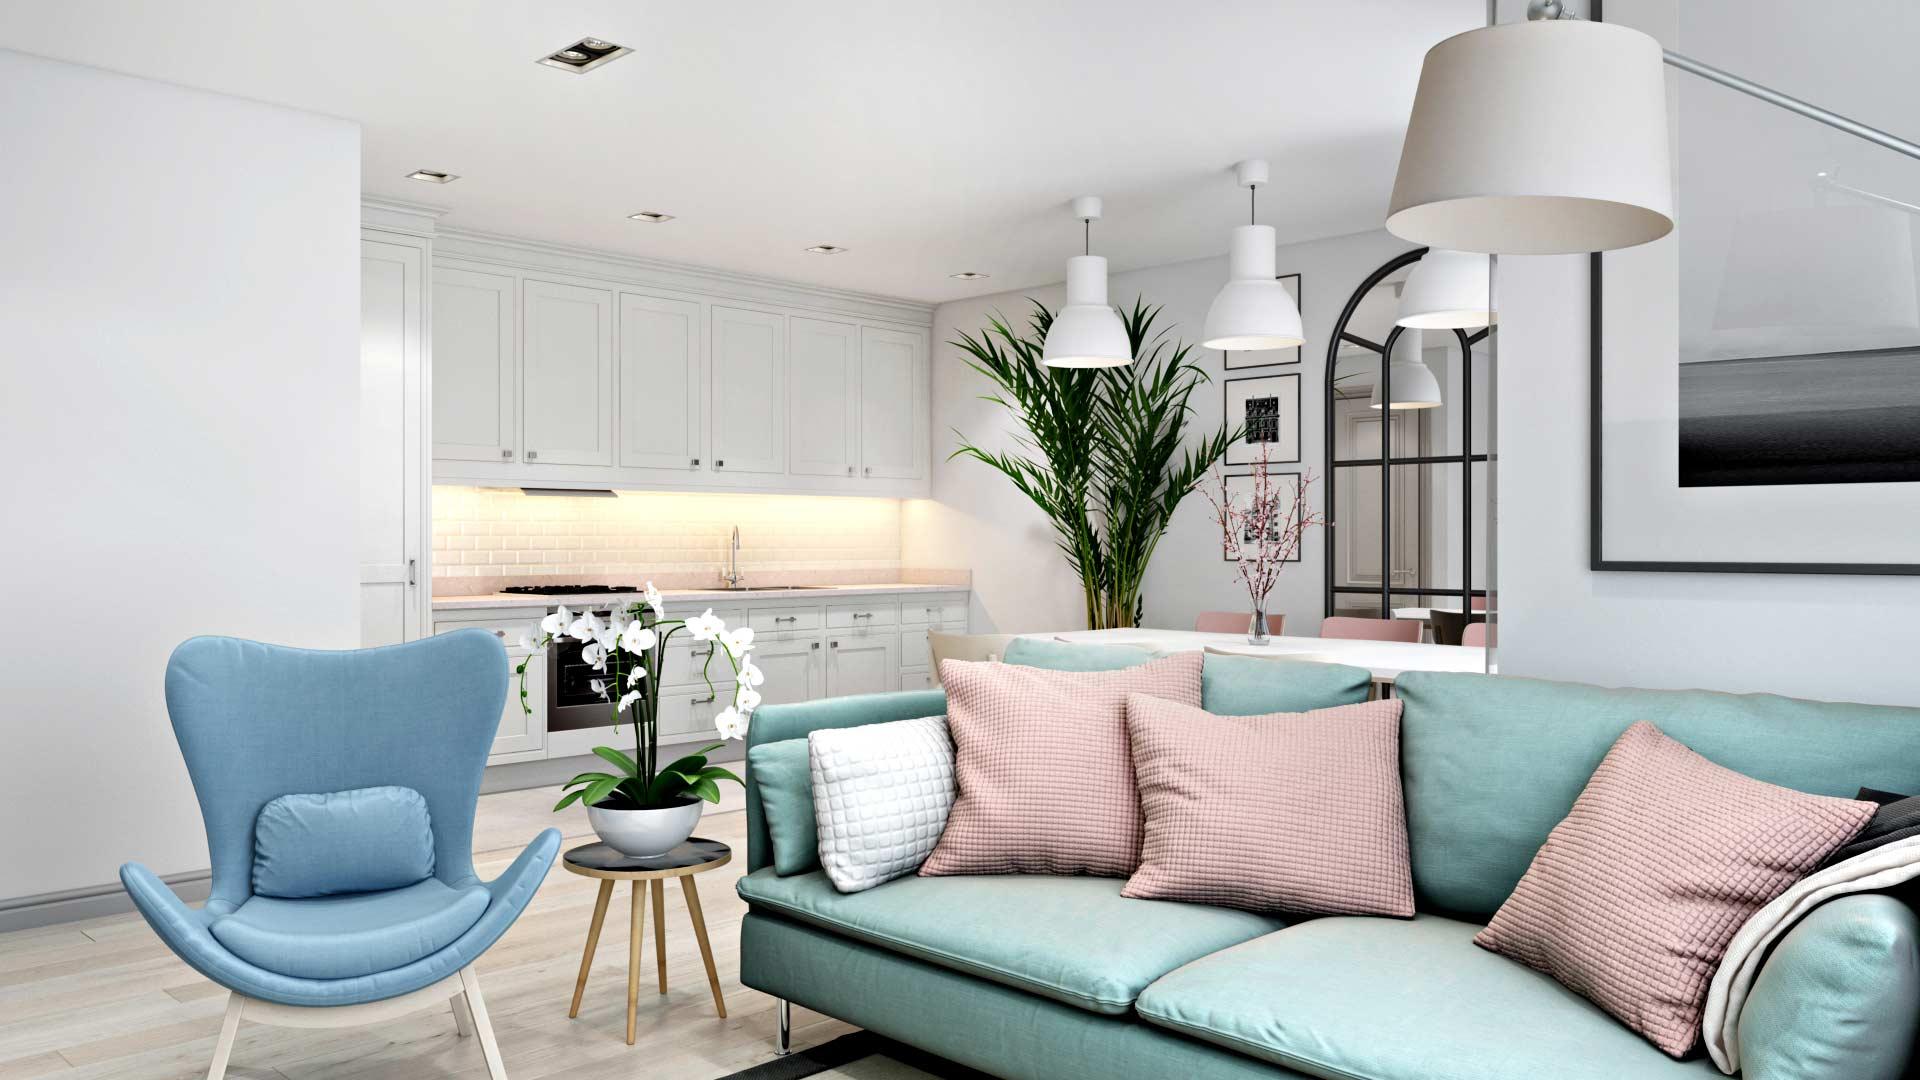 Residentie Allier - Nieuwbouw appartementen - Interieur